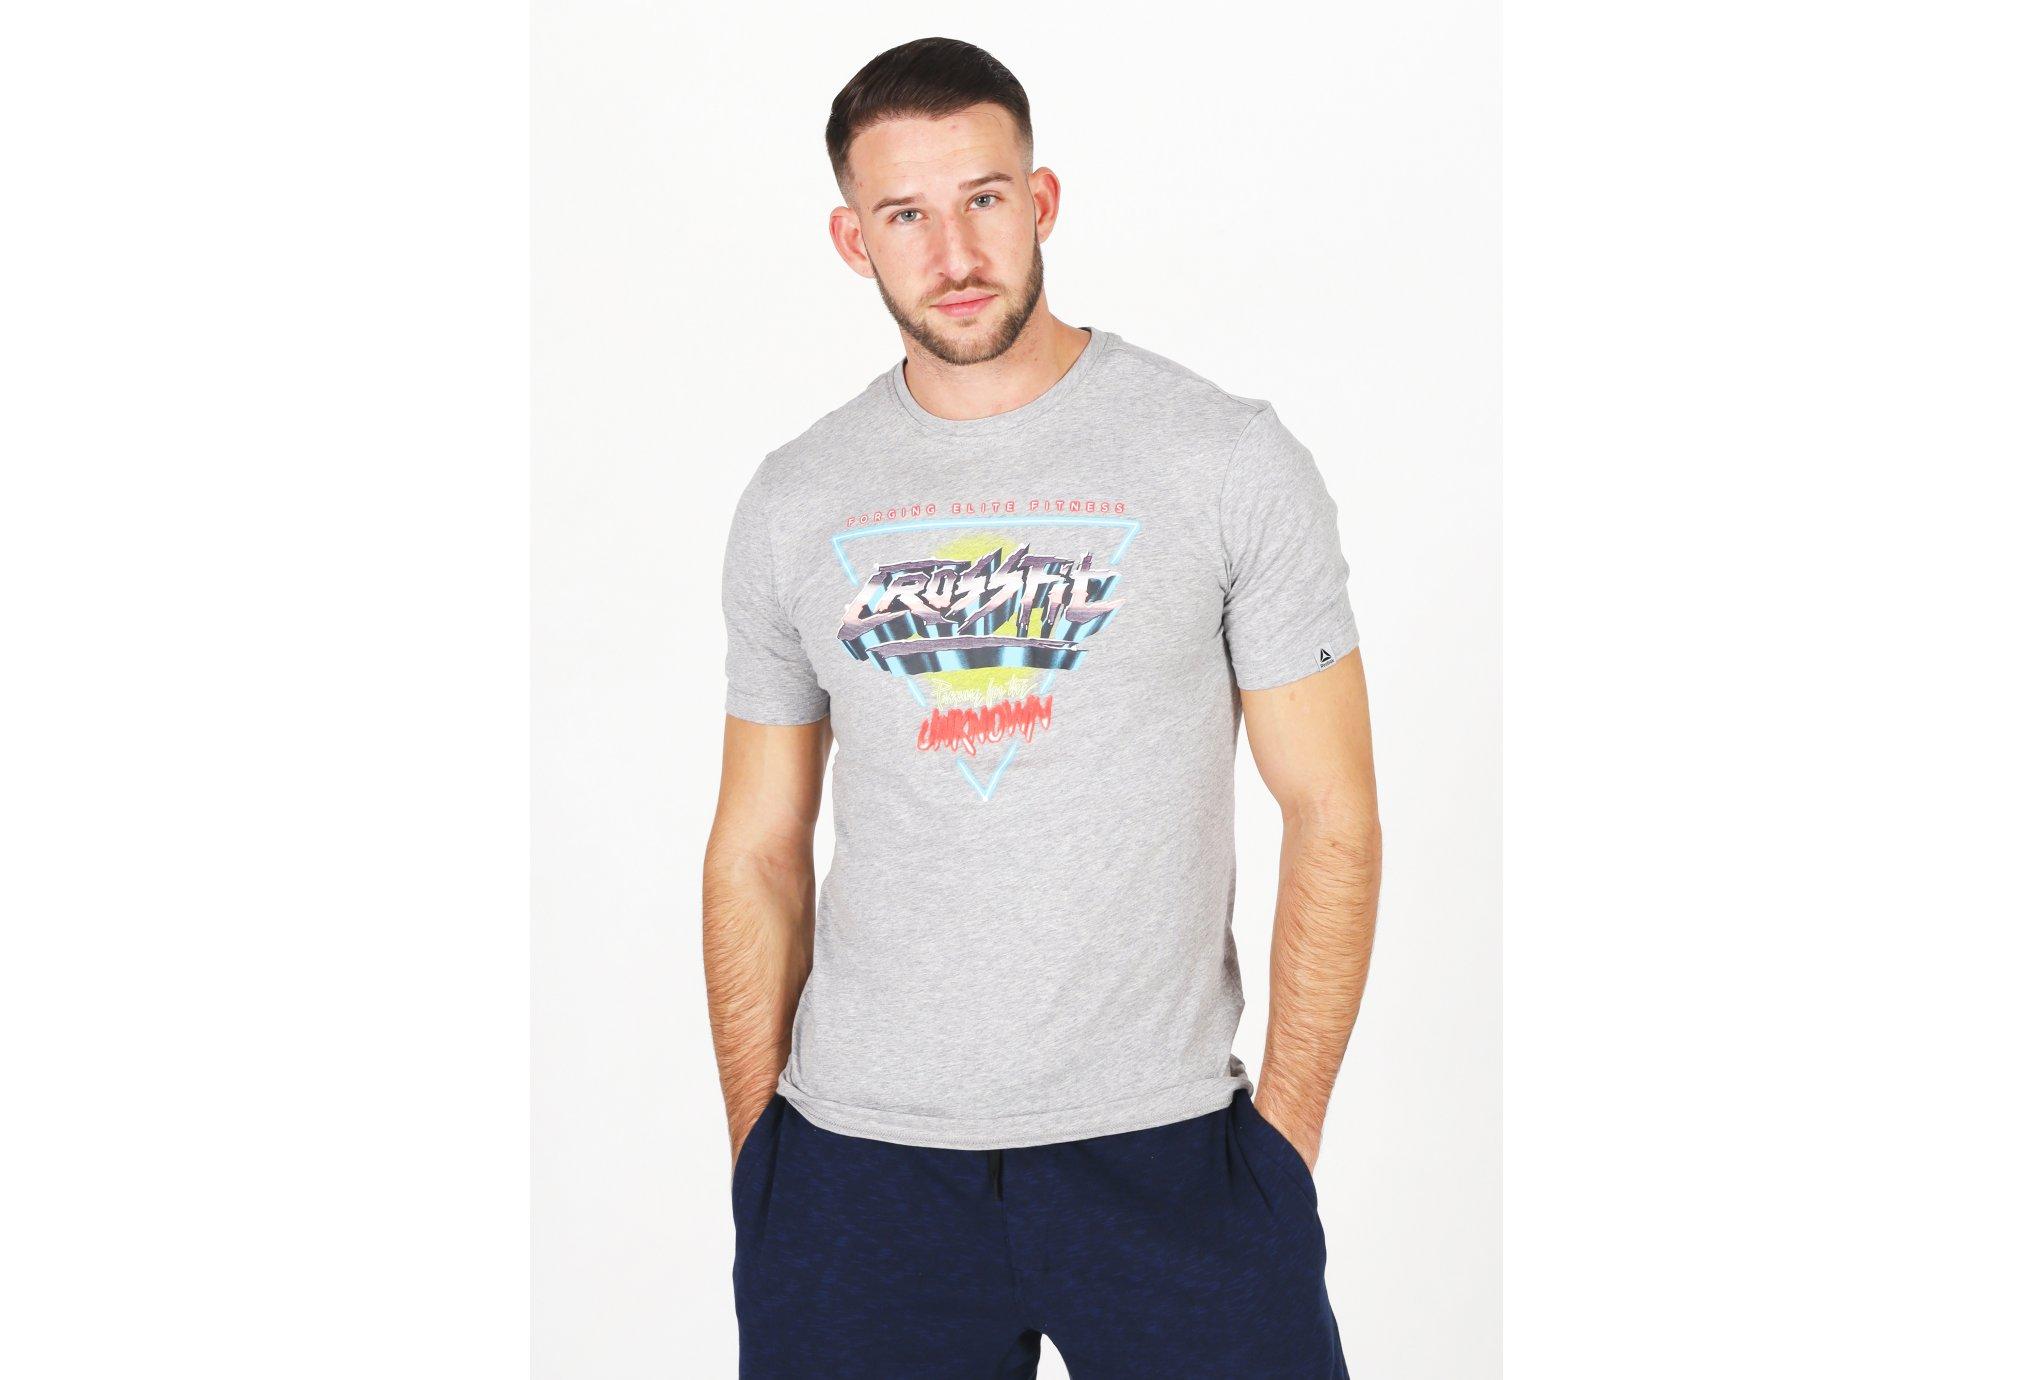 Reebok Retro Crossfit Neon M vêtement running homme